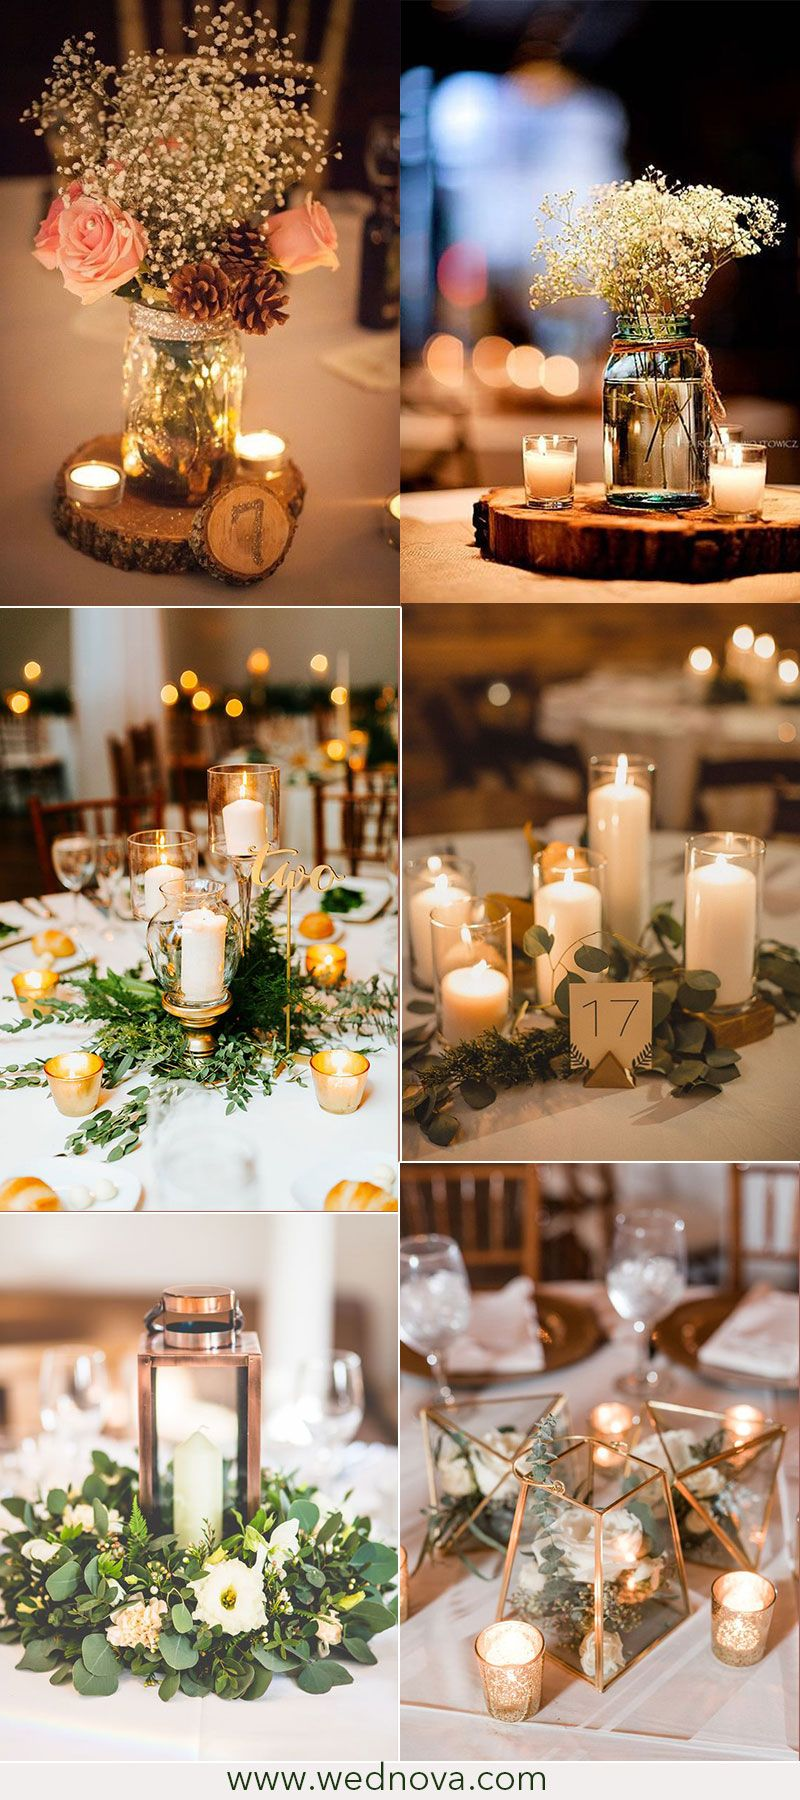 32 Greenery Wedding Decor Ideas Budget And Eco Friendly Wedding Greenery Wedding Decor Green Wedding Decorations Rustic Wedding Table Setting